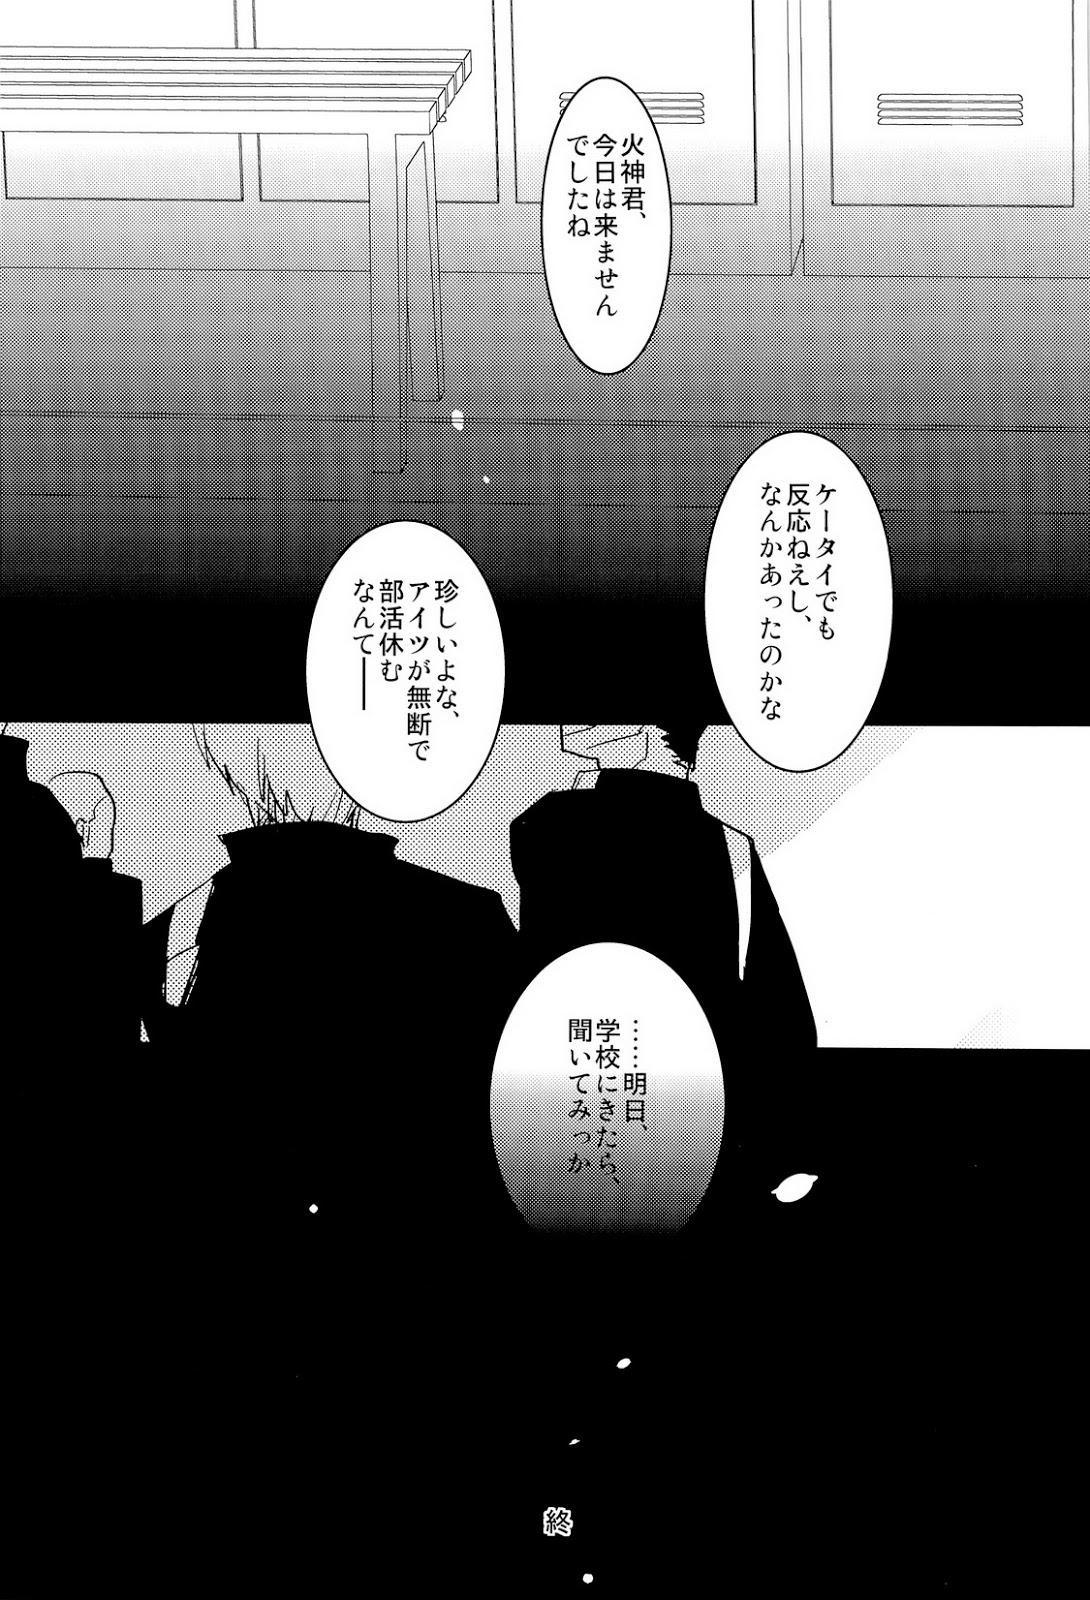 Kabejiri Hon - DK Fuck 34